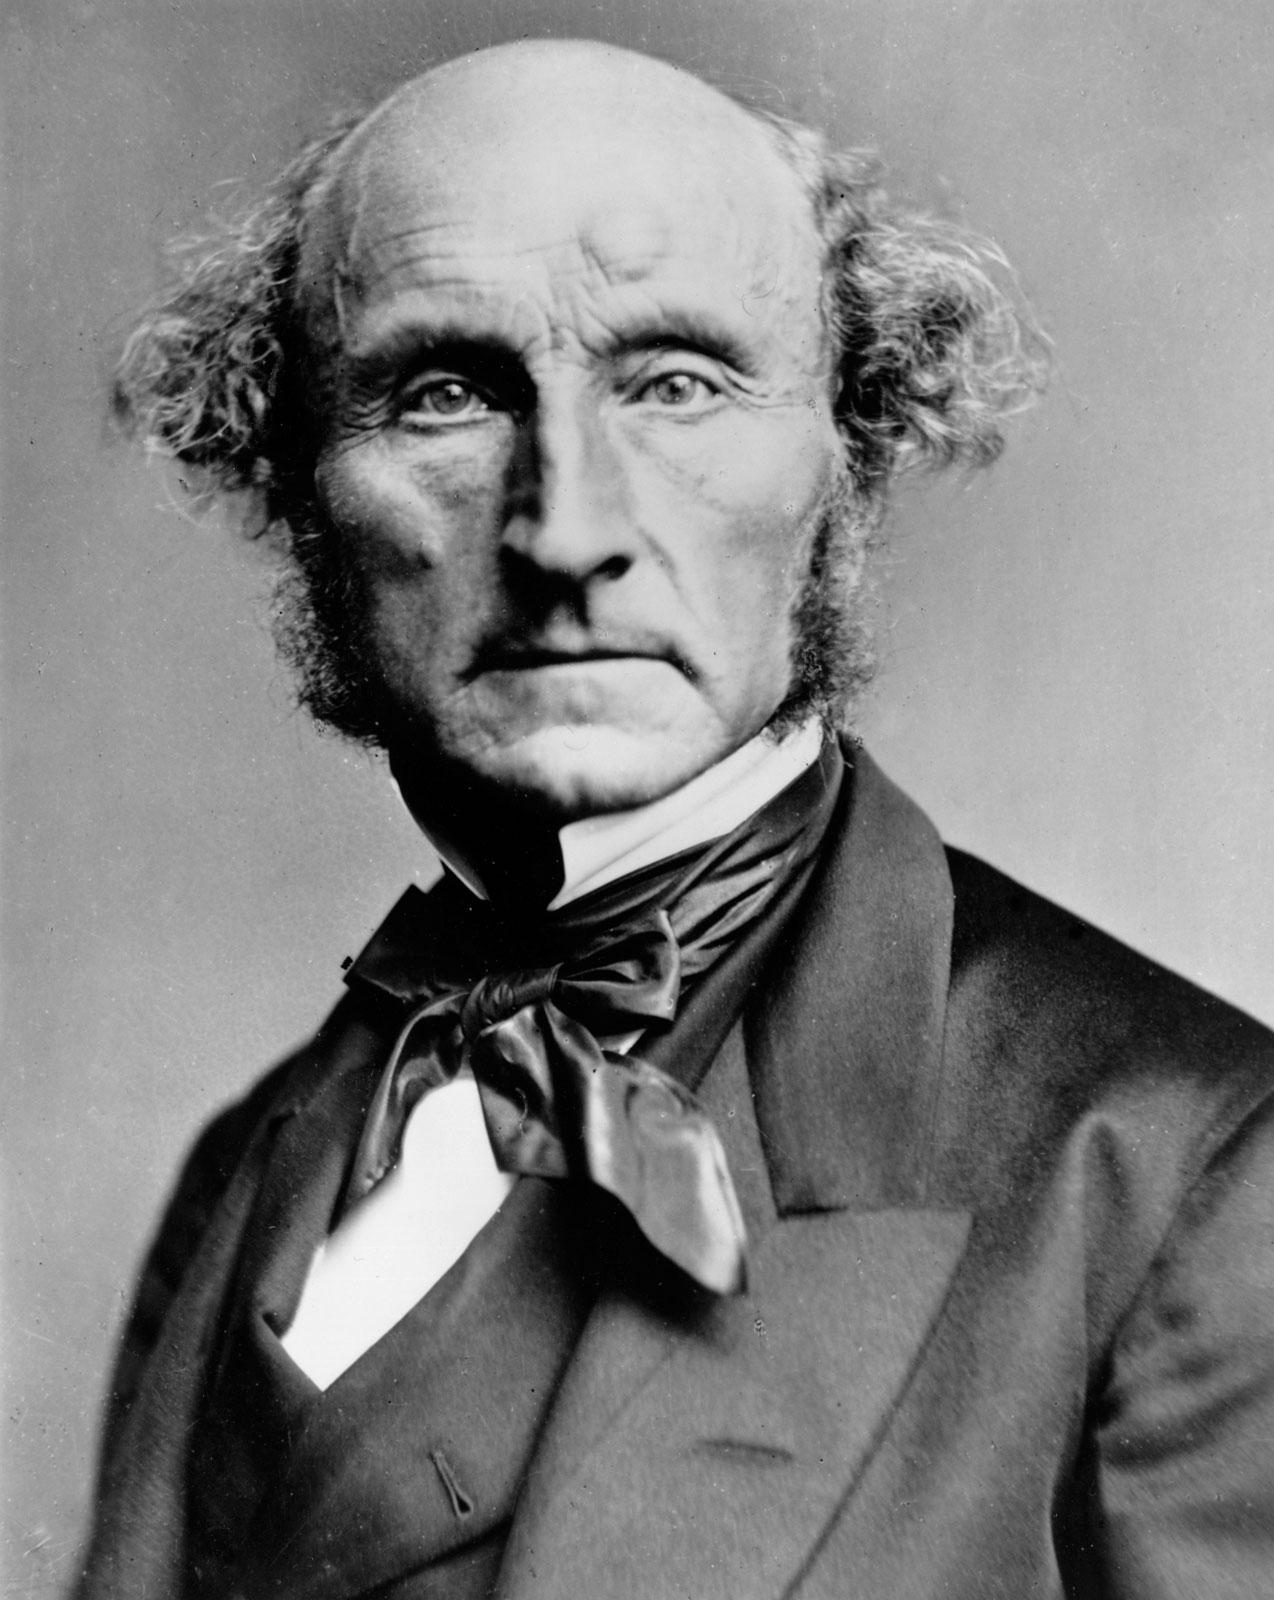 John Stuart Mill, oko 1870. godine (izvor: commons.wikimedia.org).